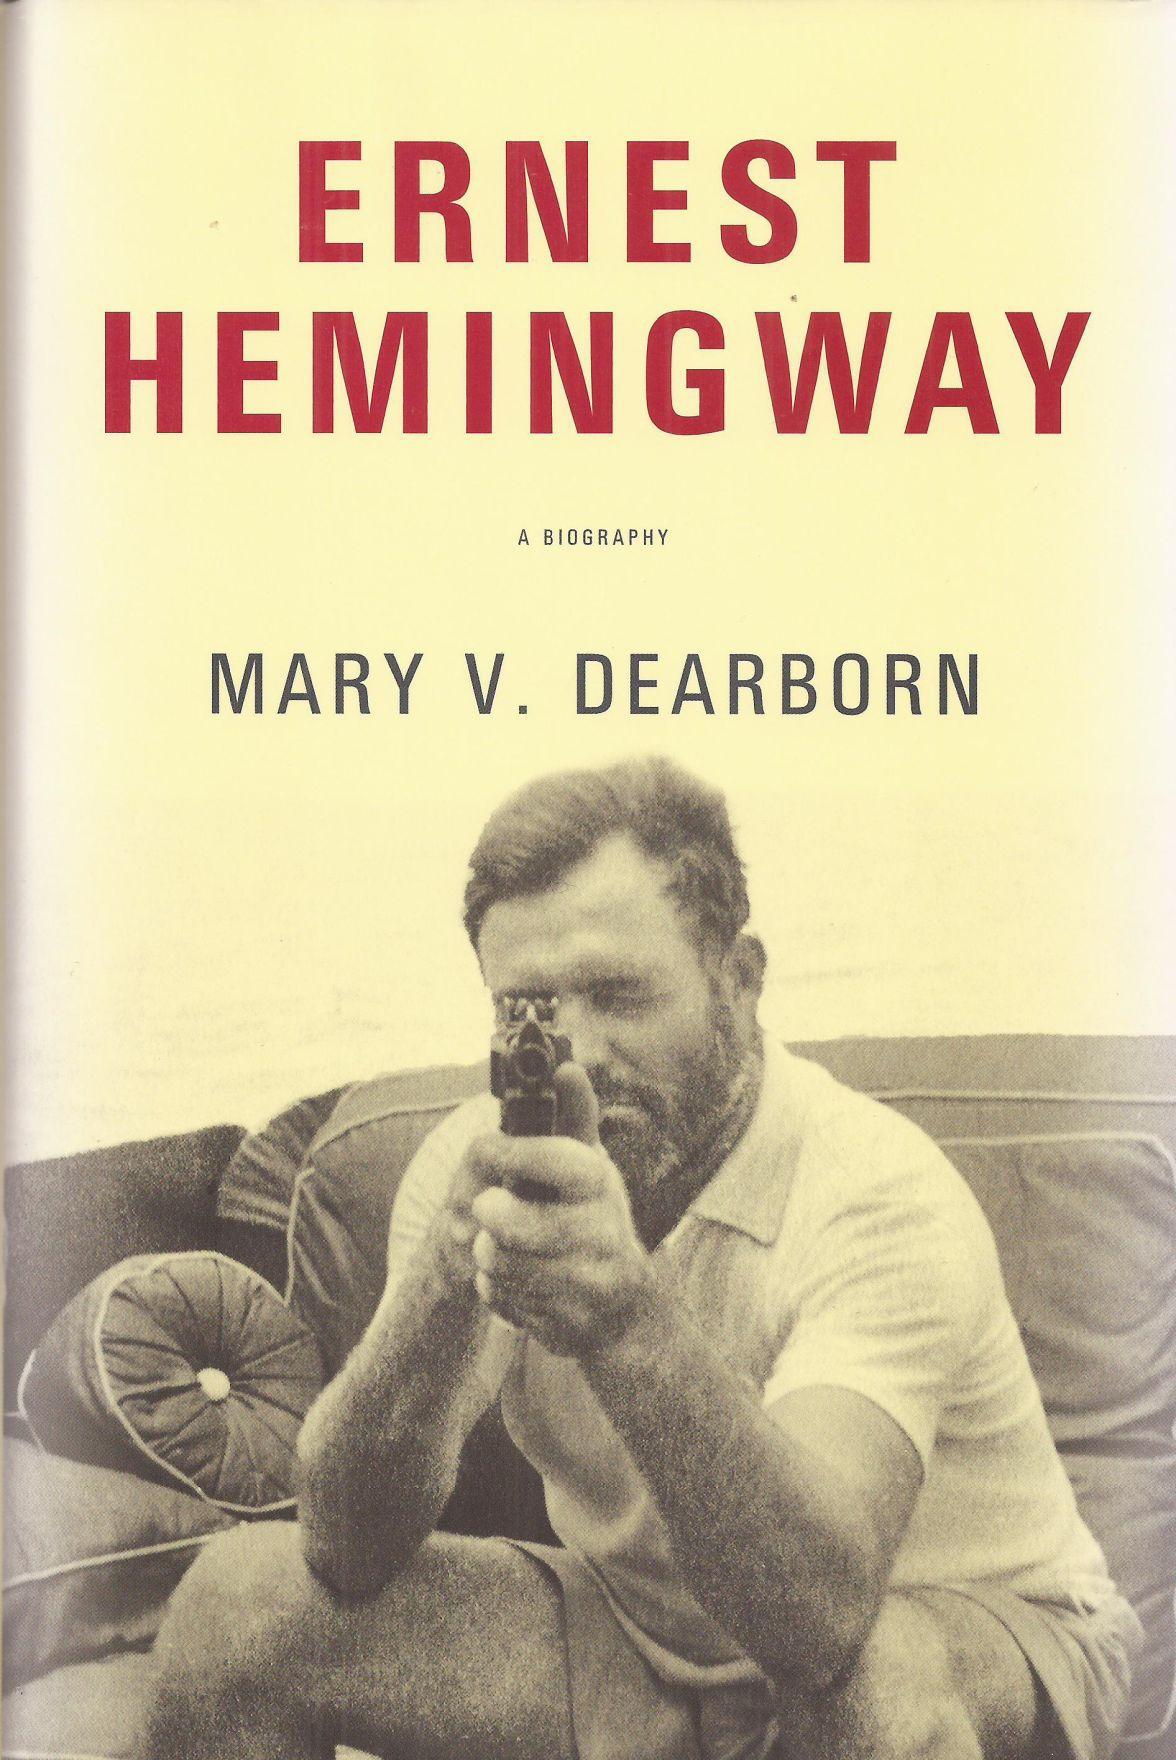 Biography of Ernest Hemingway, Pulitzer and Nobel Prize Winning Writer